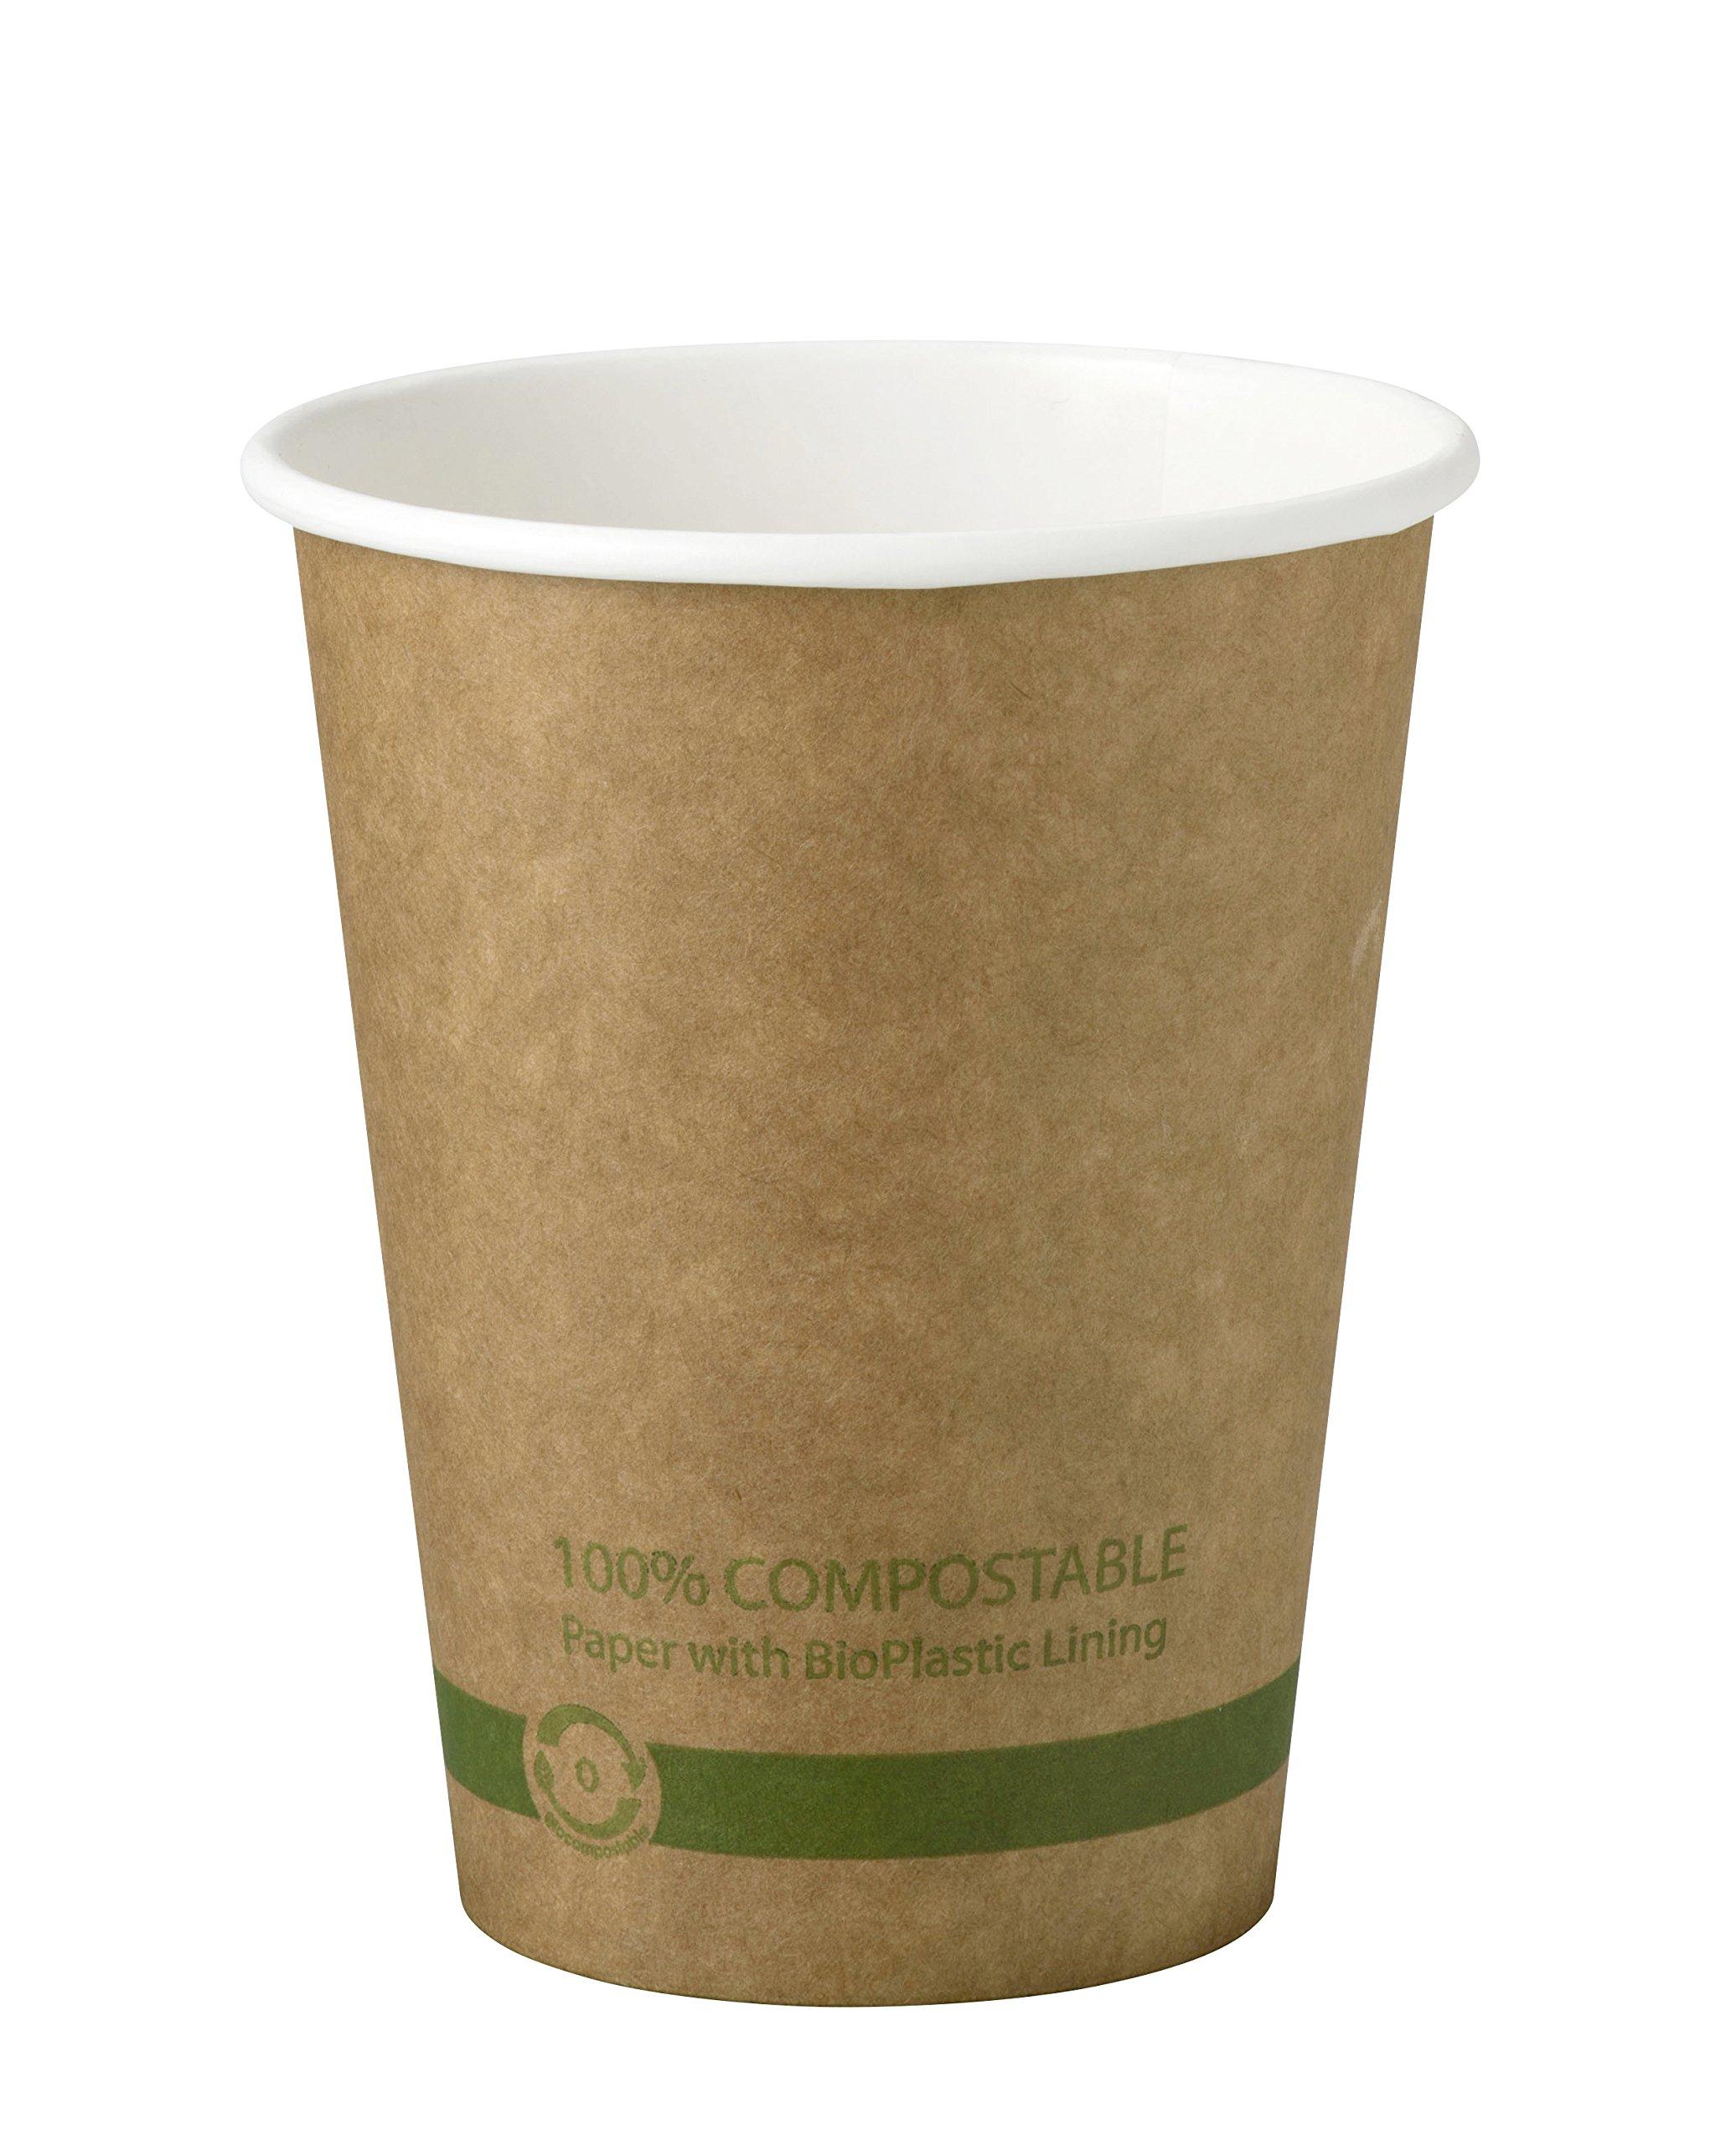 World Centric CU-PA-12-K 100% Compostable FSC Mix Paper Hot Cups, 12 oz, Kraft (Pack of 1000)